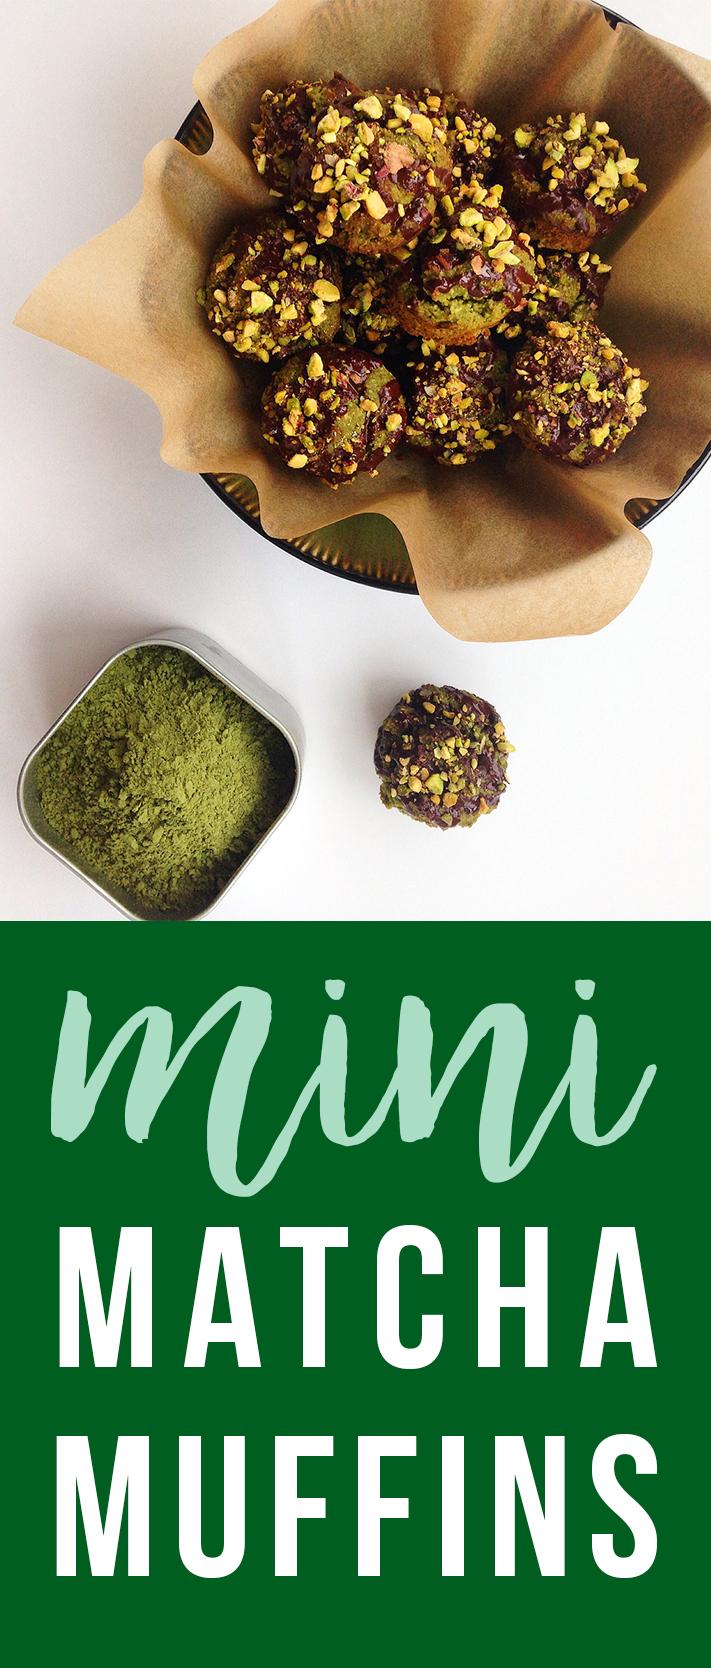 Tiny muffin with bigi matcha flavor!